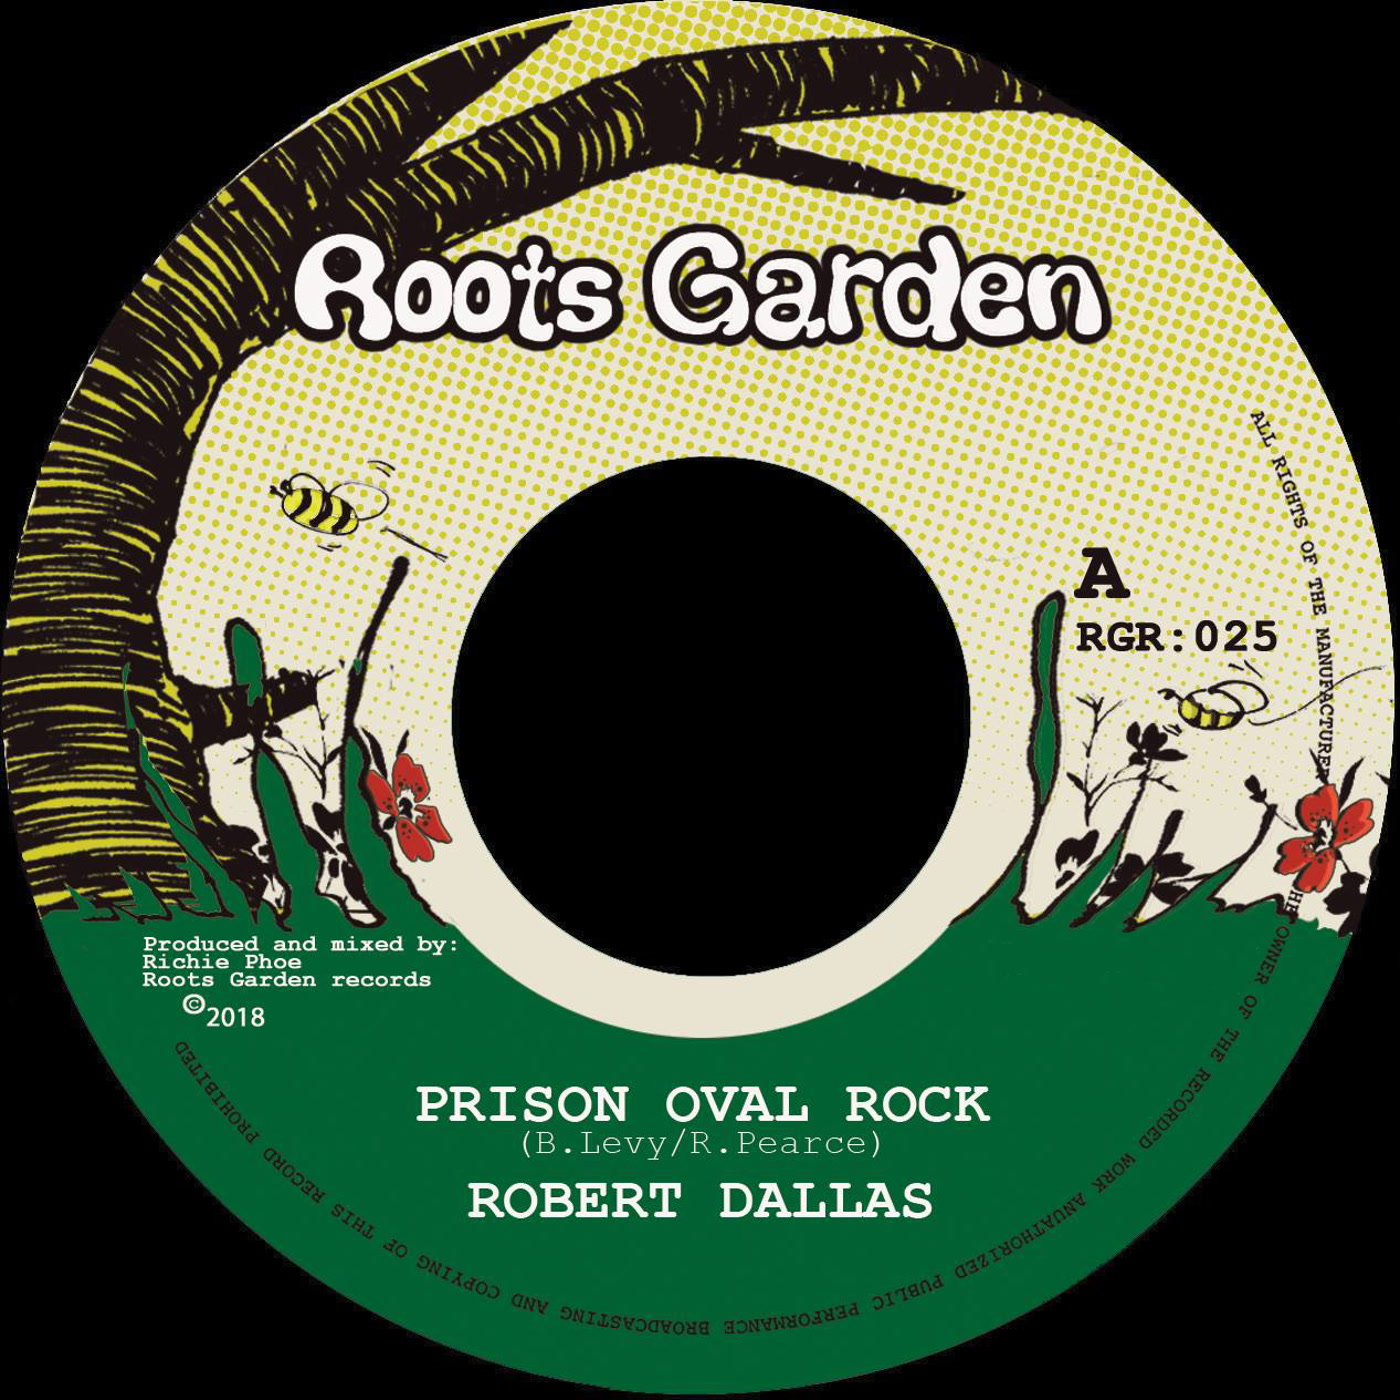 Prison Oval Rock Robert Dallas Amp Richie Phoe Kudos Records